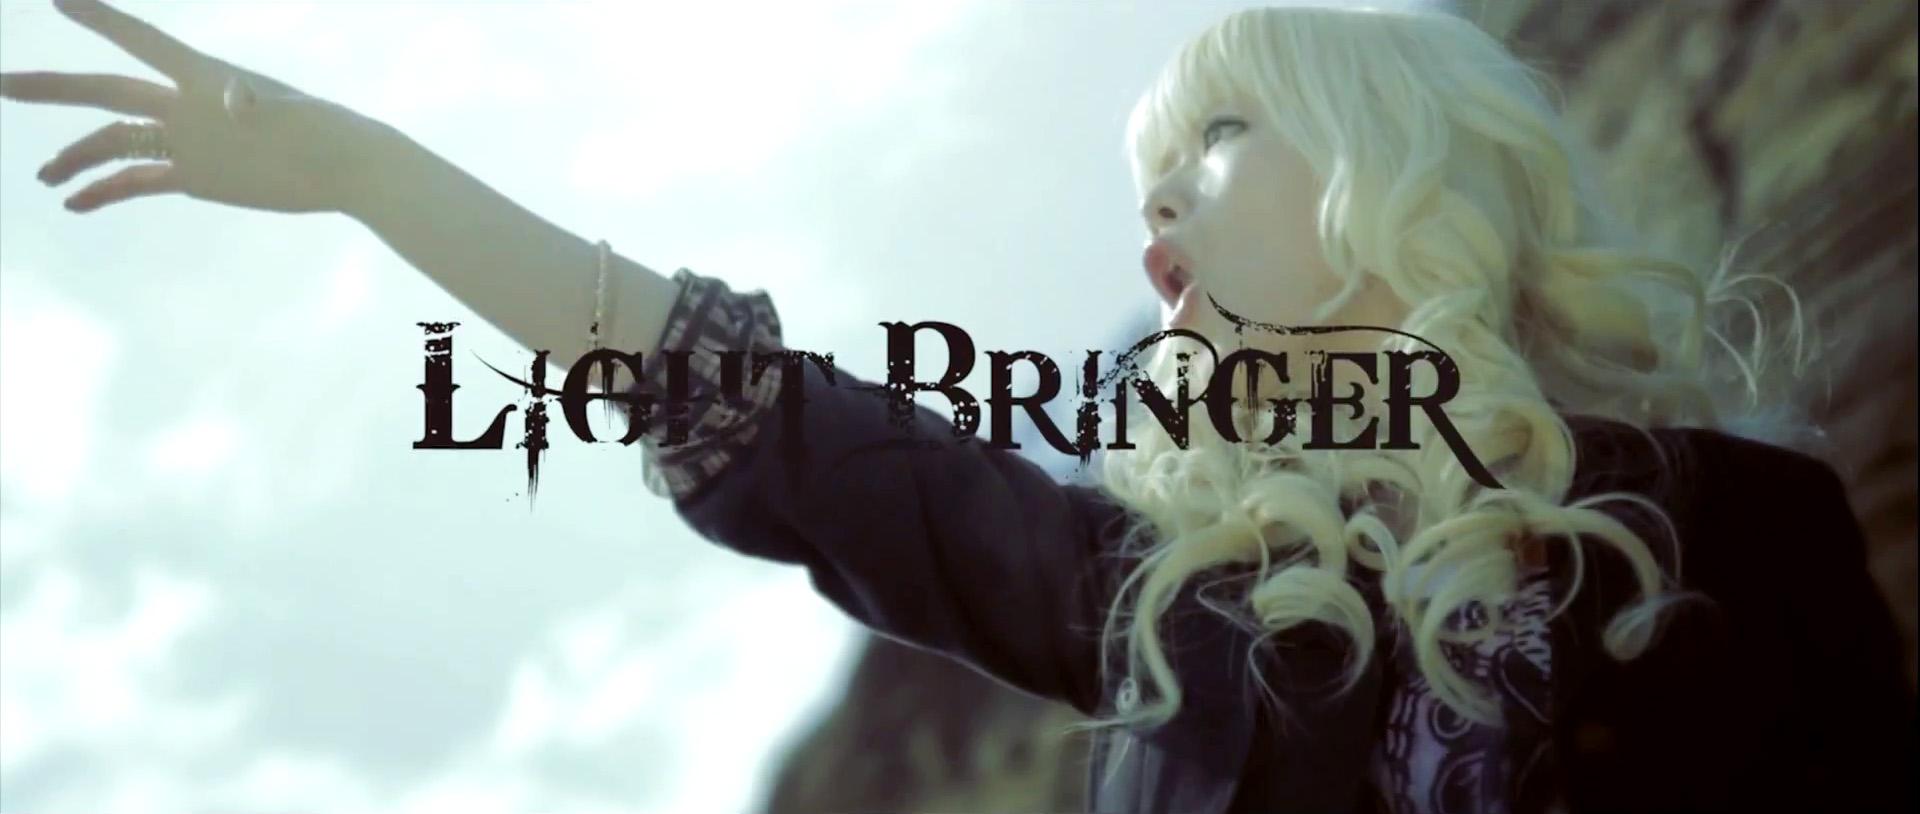 JRock247-LIGHT-BRINGER-Hyperion-teaserA